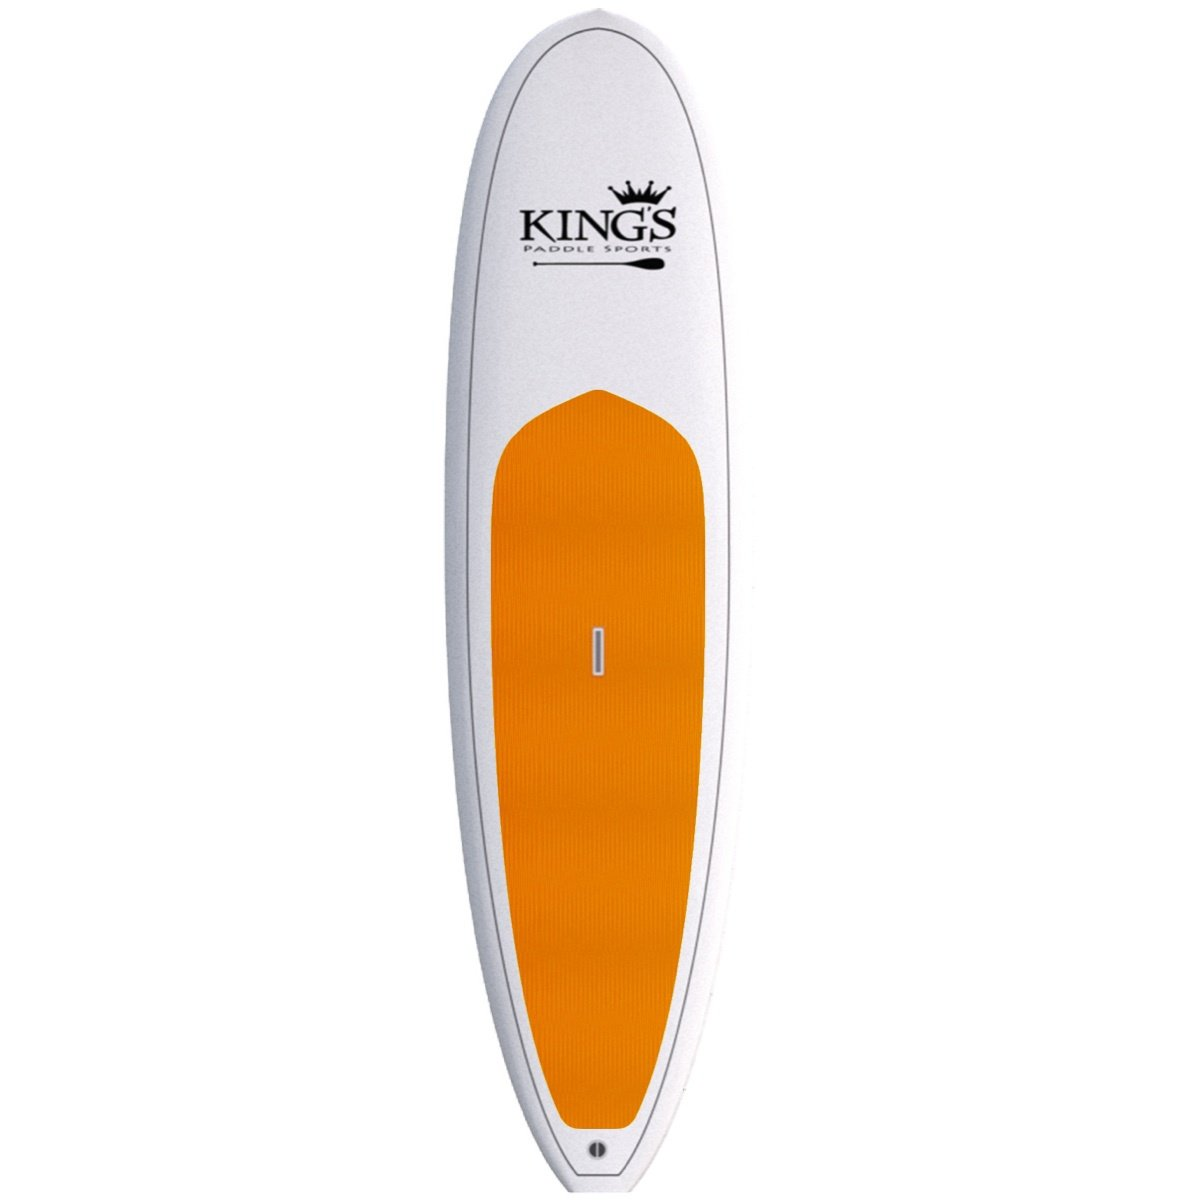 King's SUP Deck Pad Orange